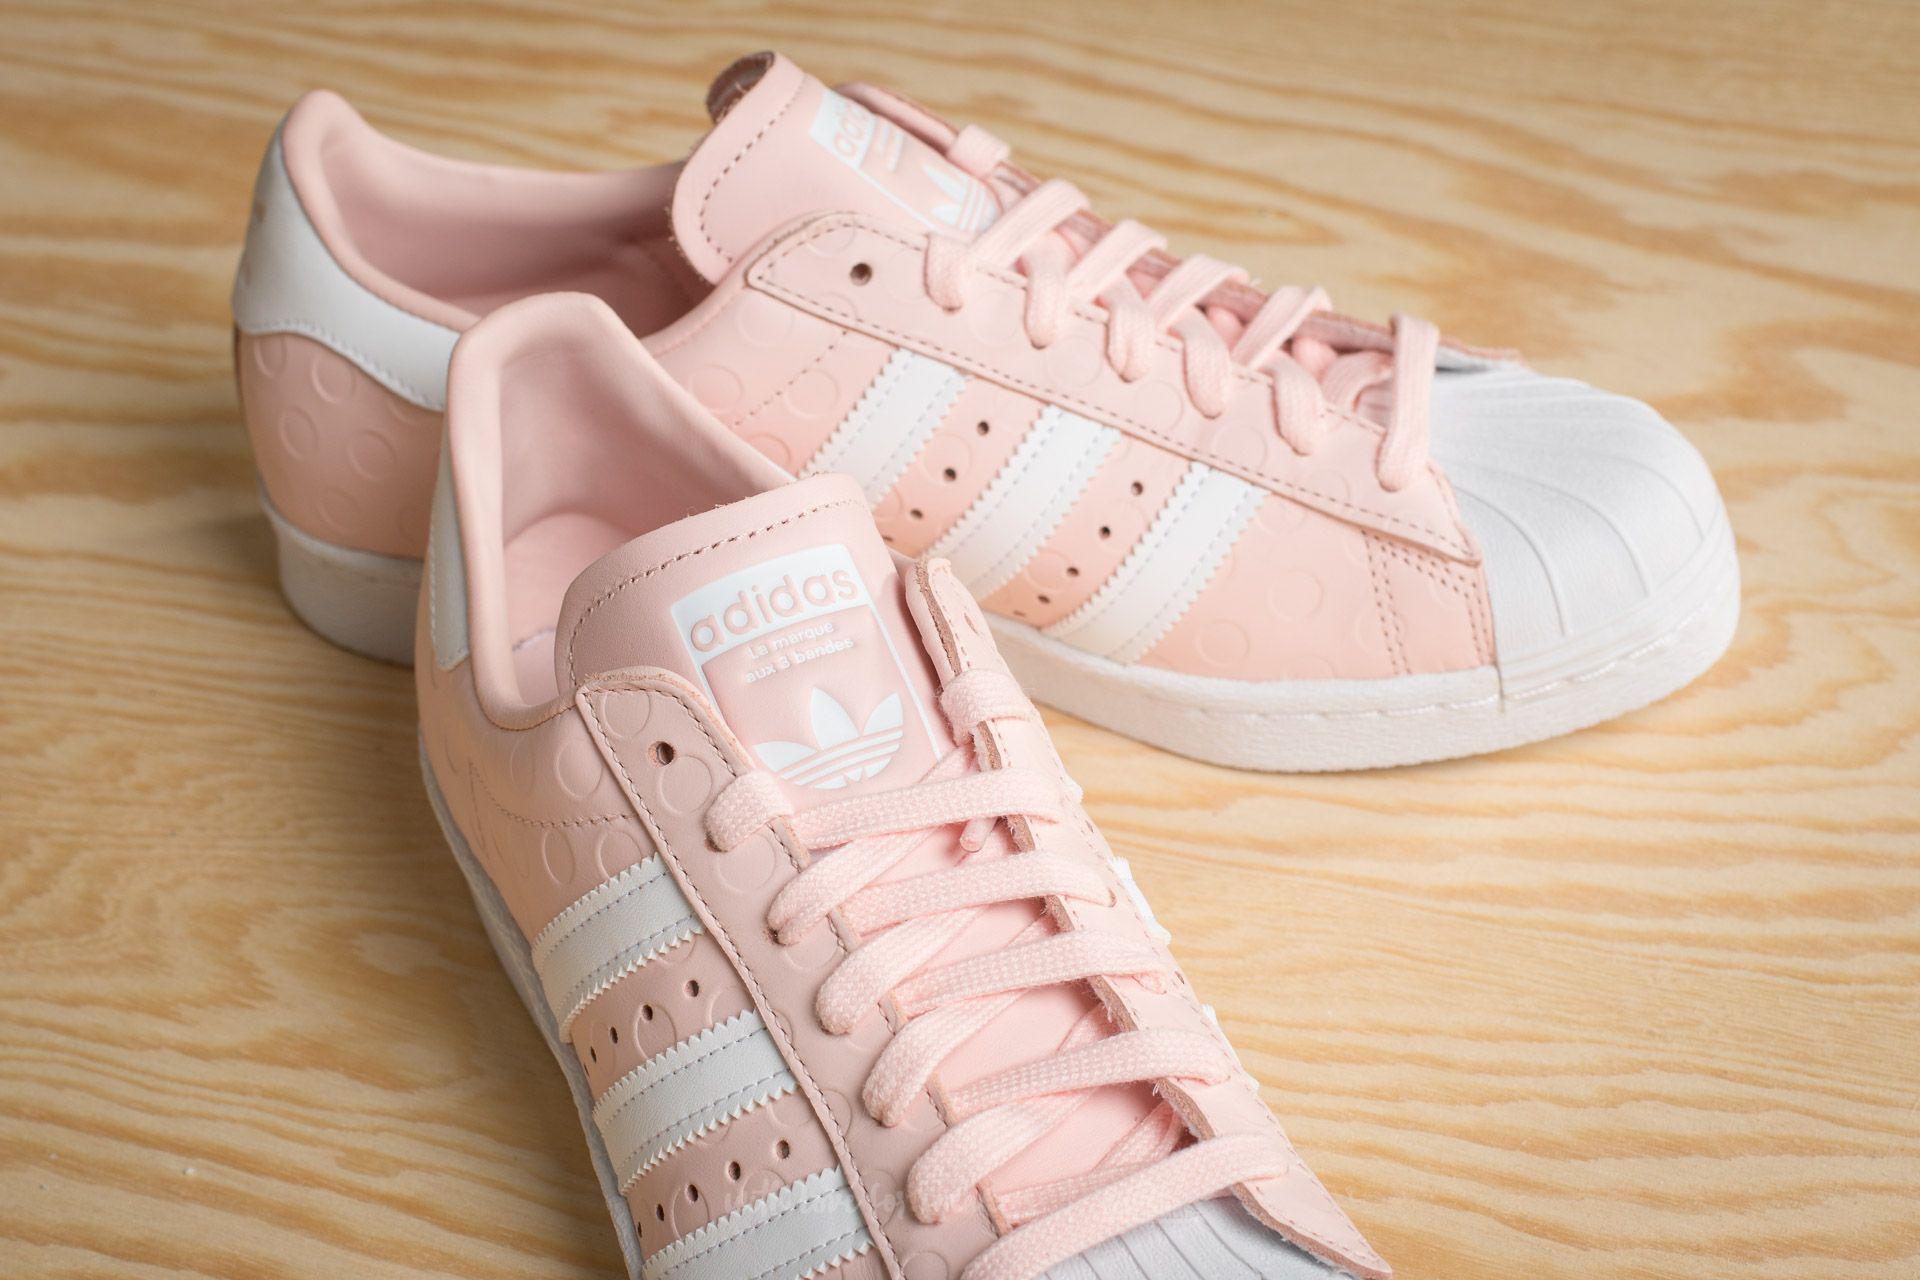 a71a26f2ab3925 Lyst - adidas Originals Adidas Superstar 80s W Icey Pink  Ftw White ...